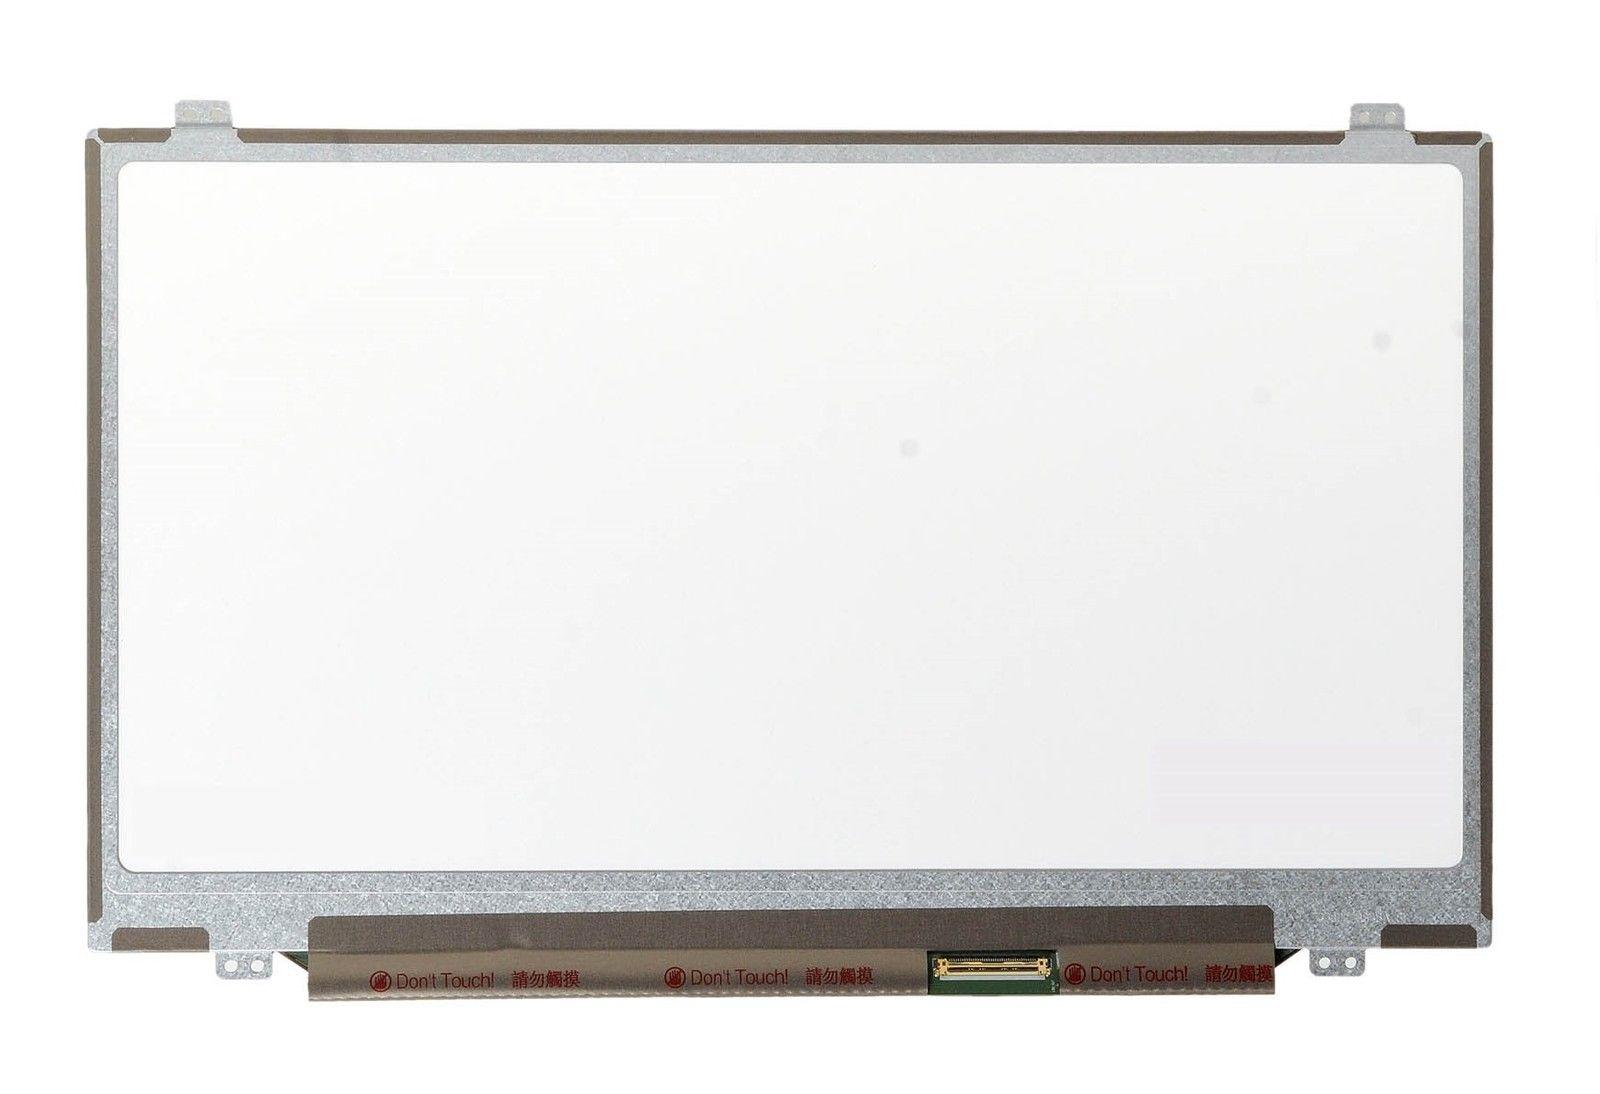 N140BGE-L42 New 14.0 WXGA HD Slim LED LCD Screen N140BGE-LB2 Display Panel ht140wxb 501 new 14 0 led lcd screen wxga hd panel display